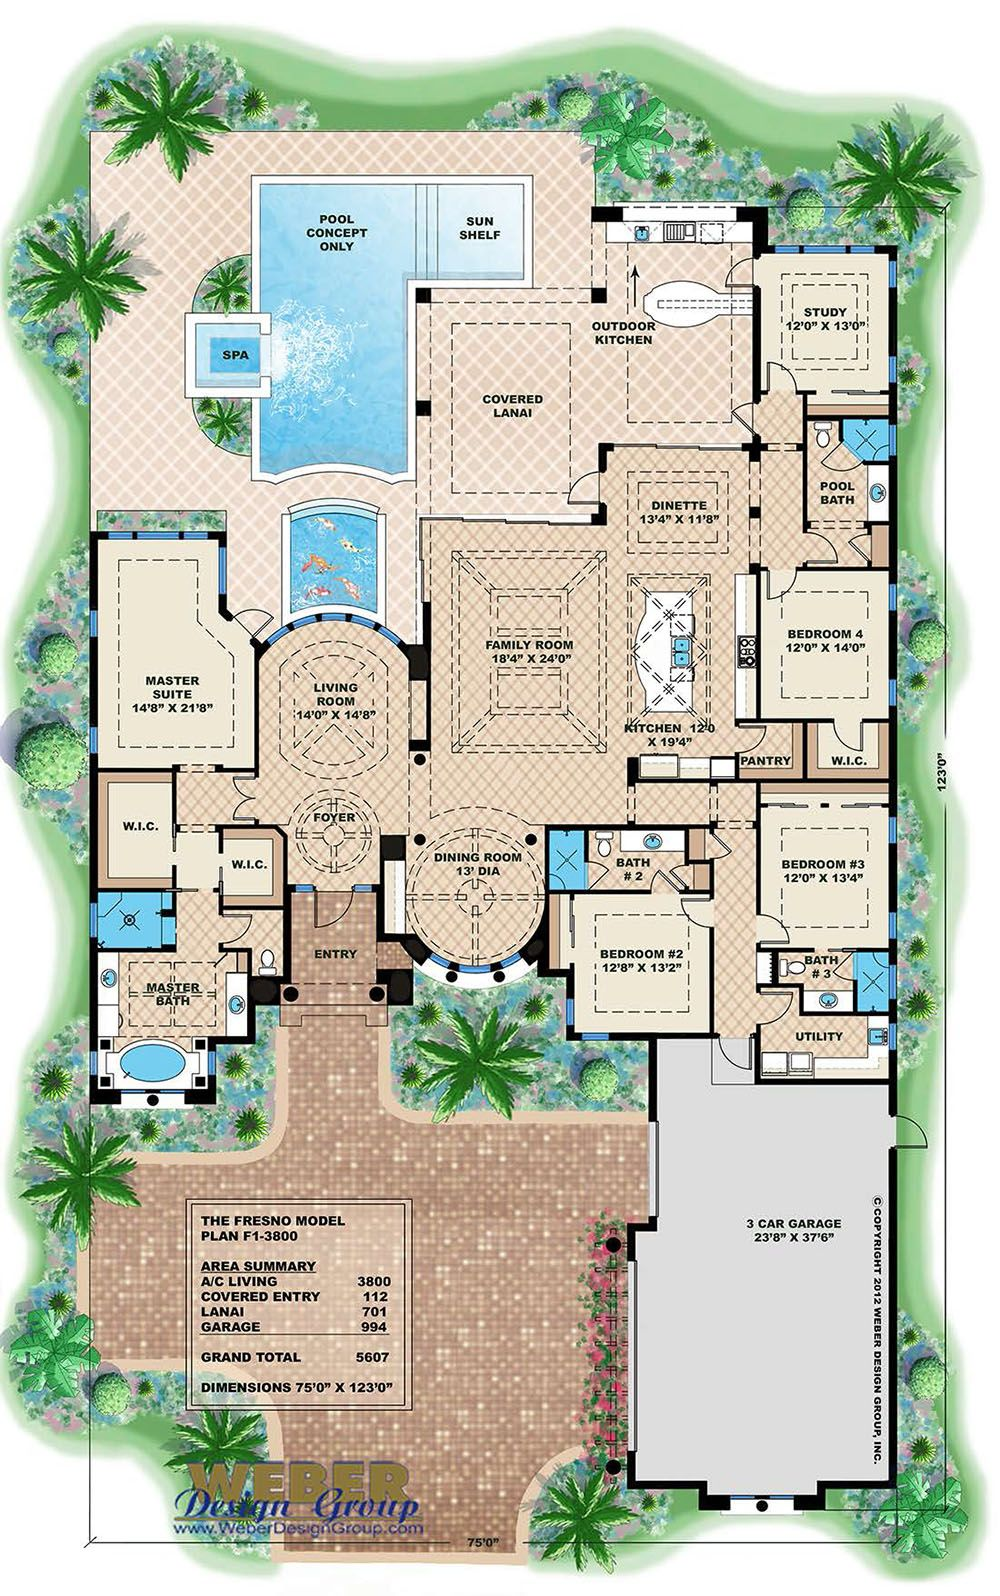 Mediterranean House Plan Luxury 1 Story Home Floor Plan With Pool Mediterranean Style House Plans Luxury House Plans Beach House Flooring